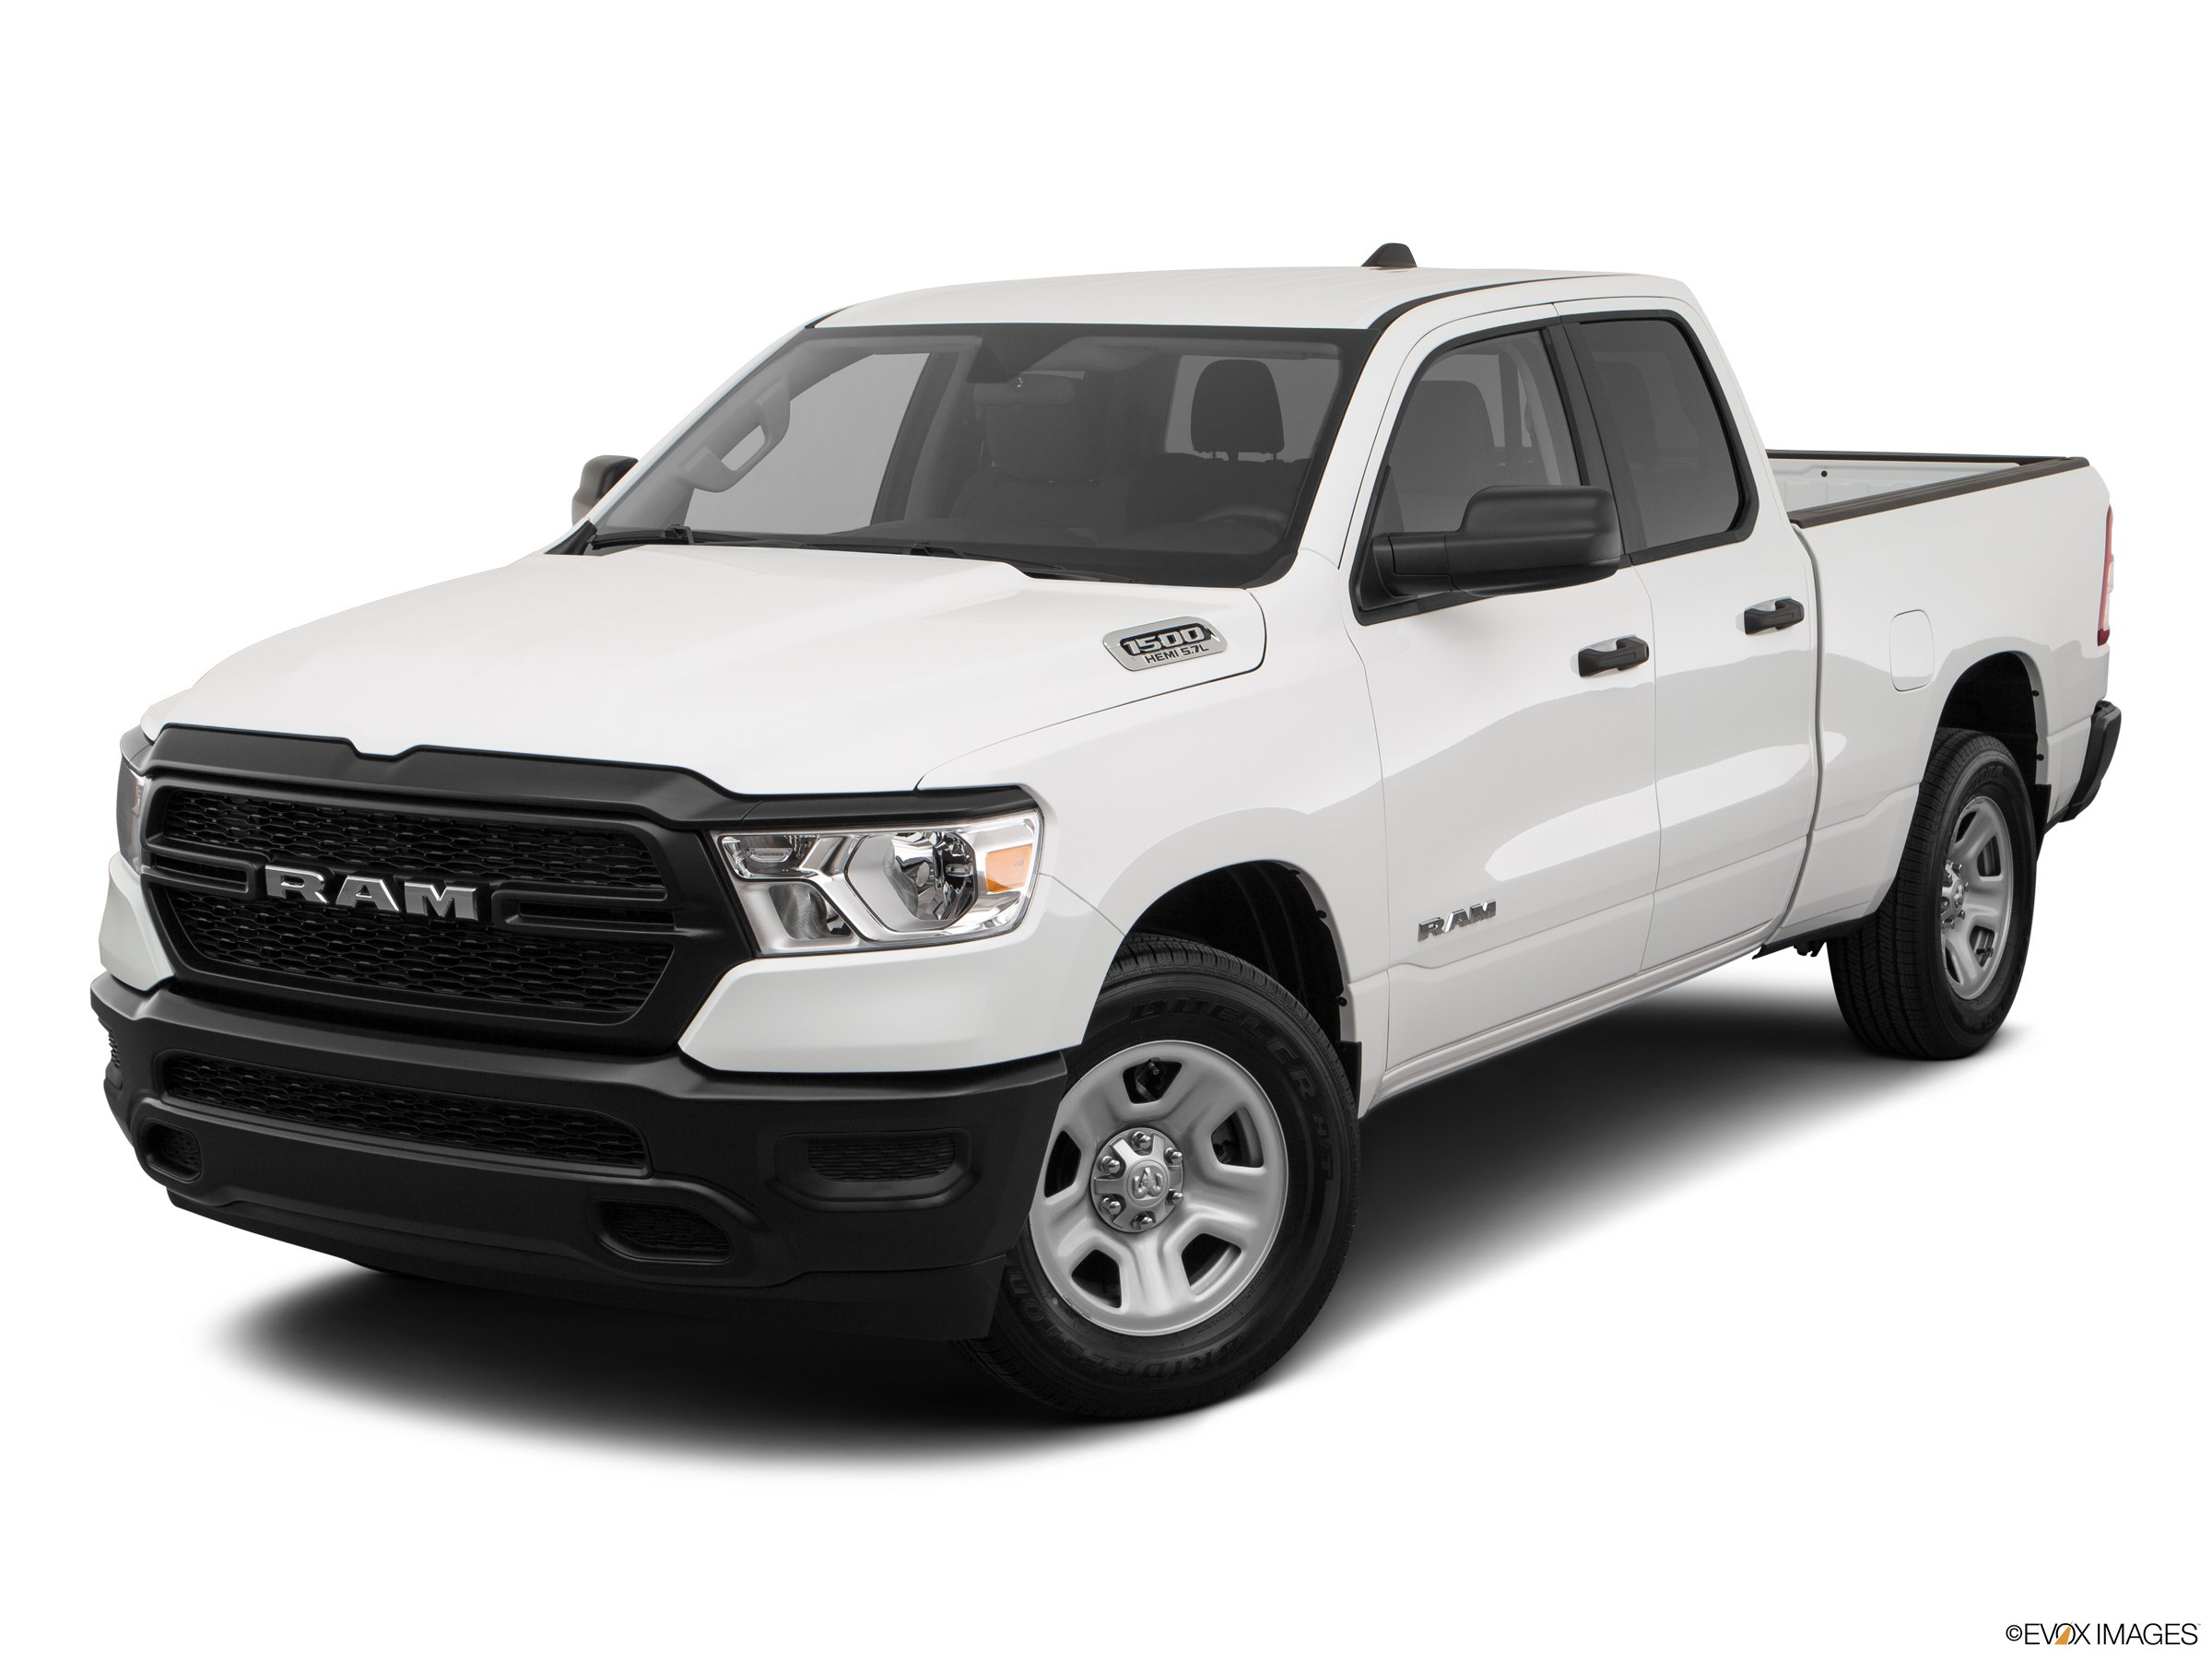 2020 RAM 1500 Tradesman RWD pickup